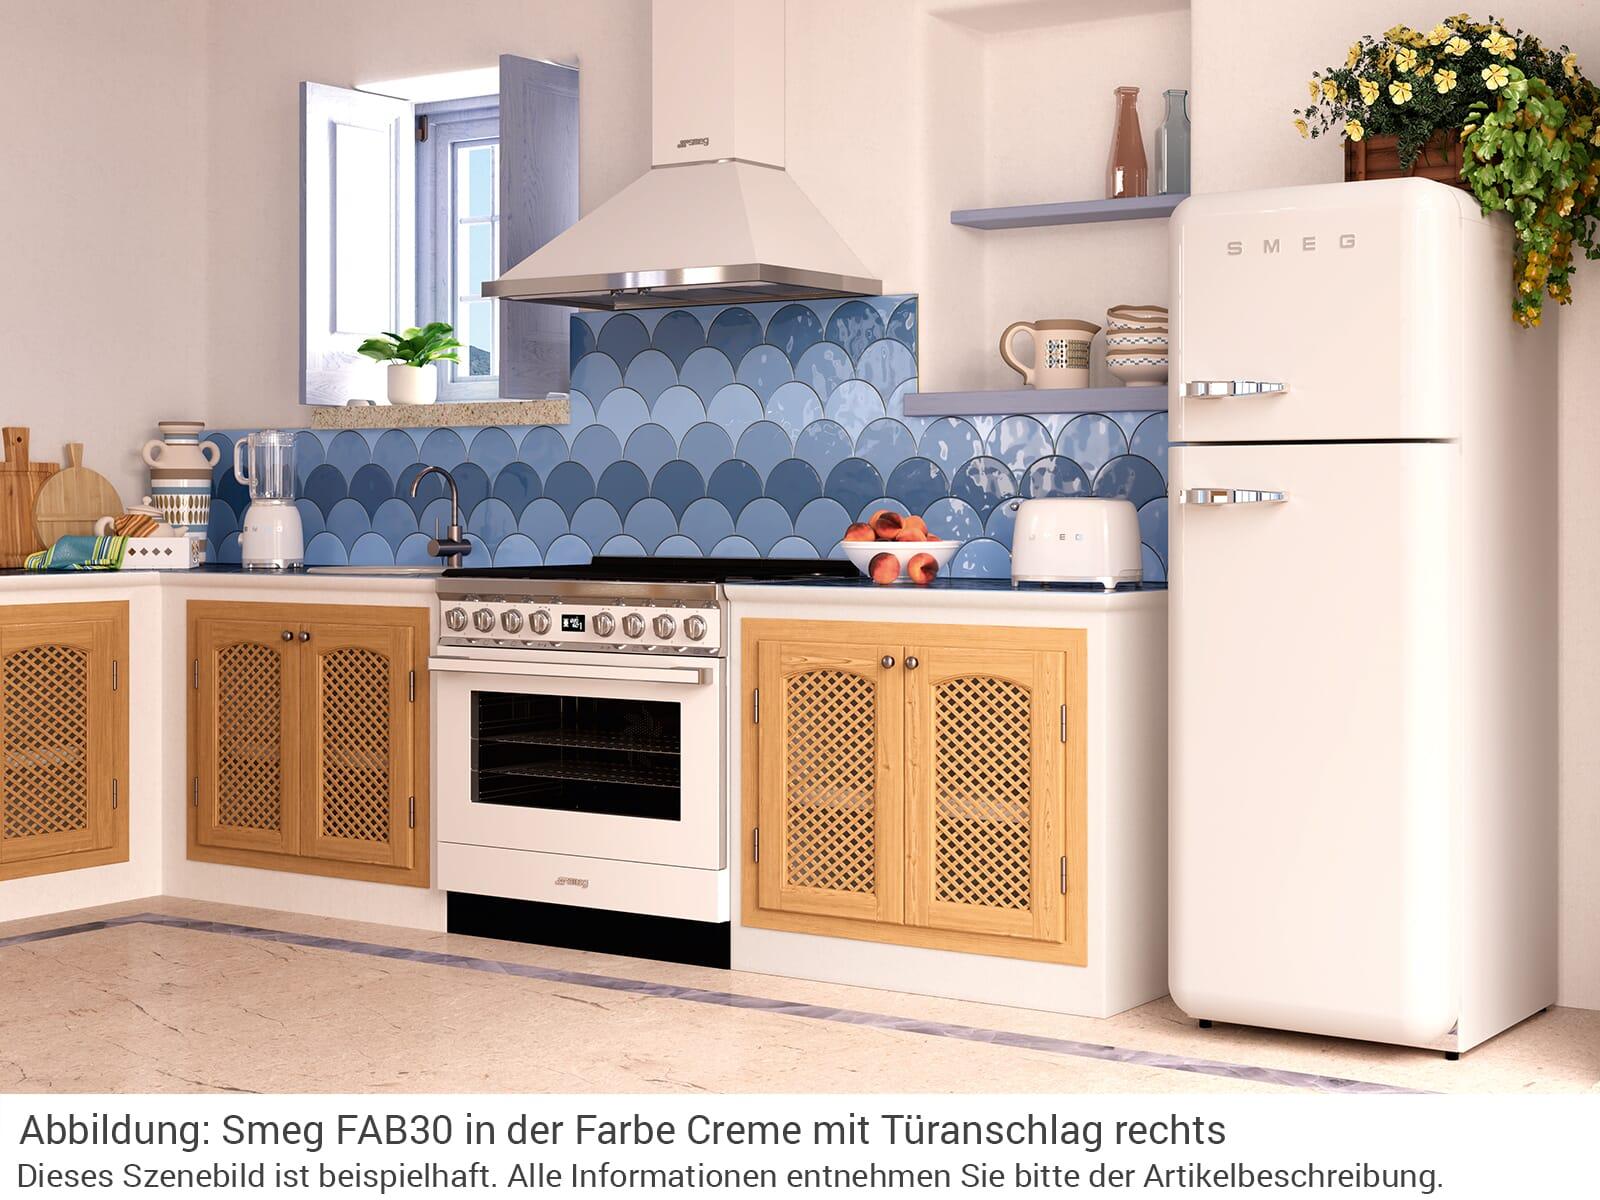 Smeg FAB30LCR5 Kühl-Gefrierkombination Creme